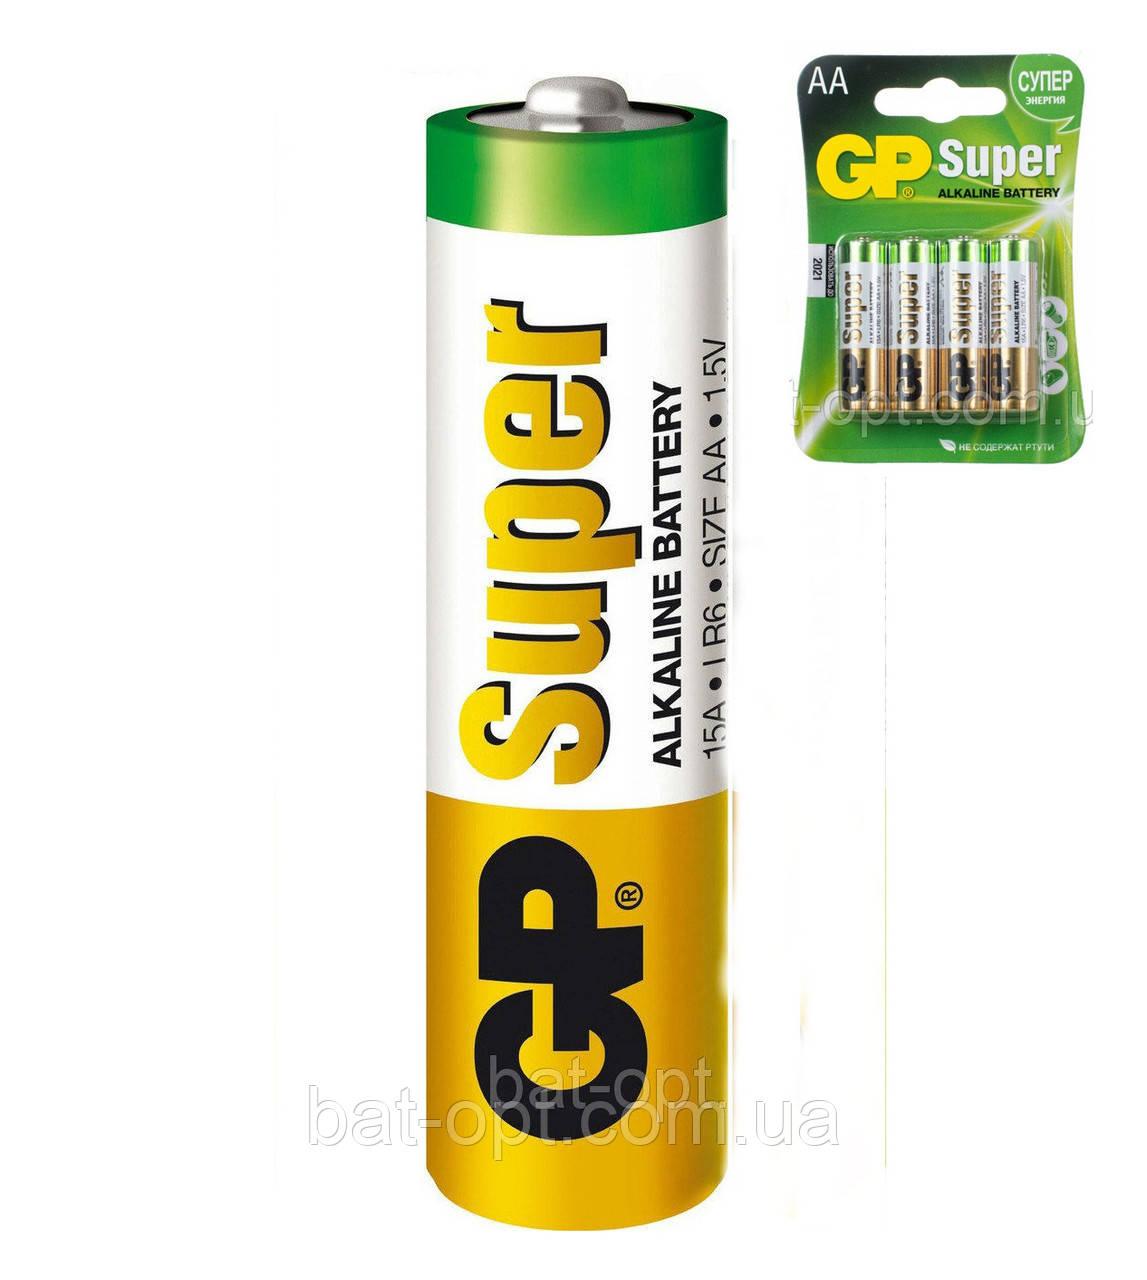 Батарейка щелочная GP 15A-U4 Super Alkaline LR6 AA пальчиковая (блистер)